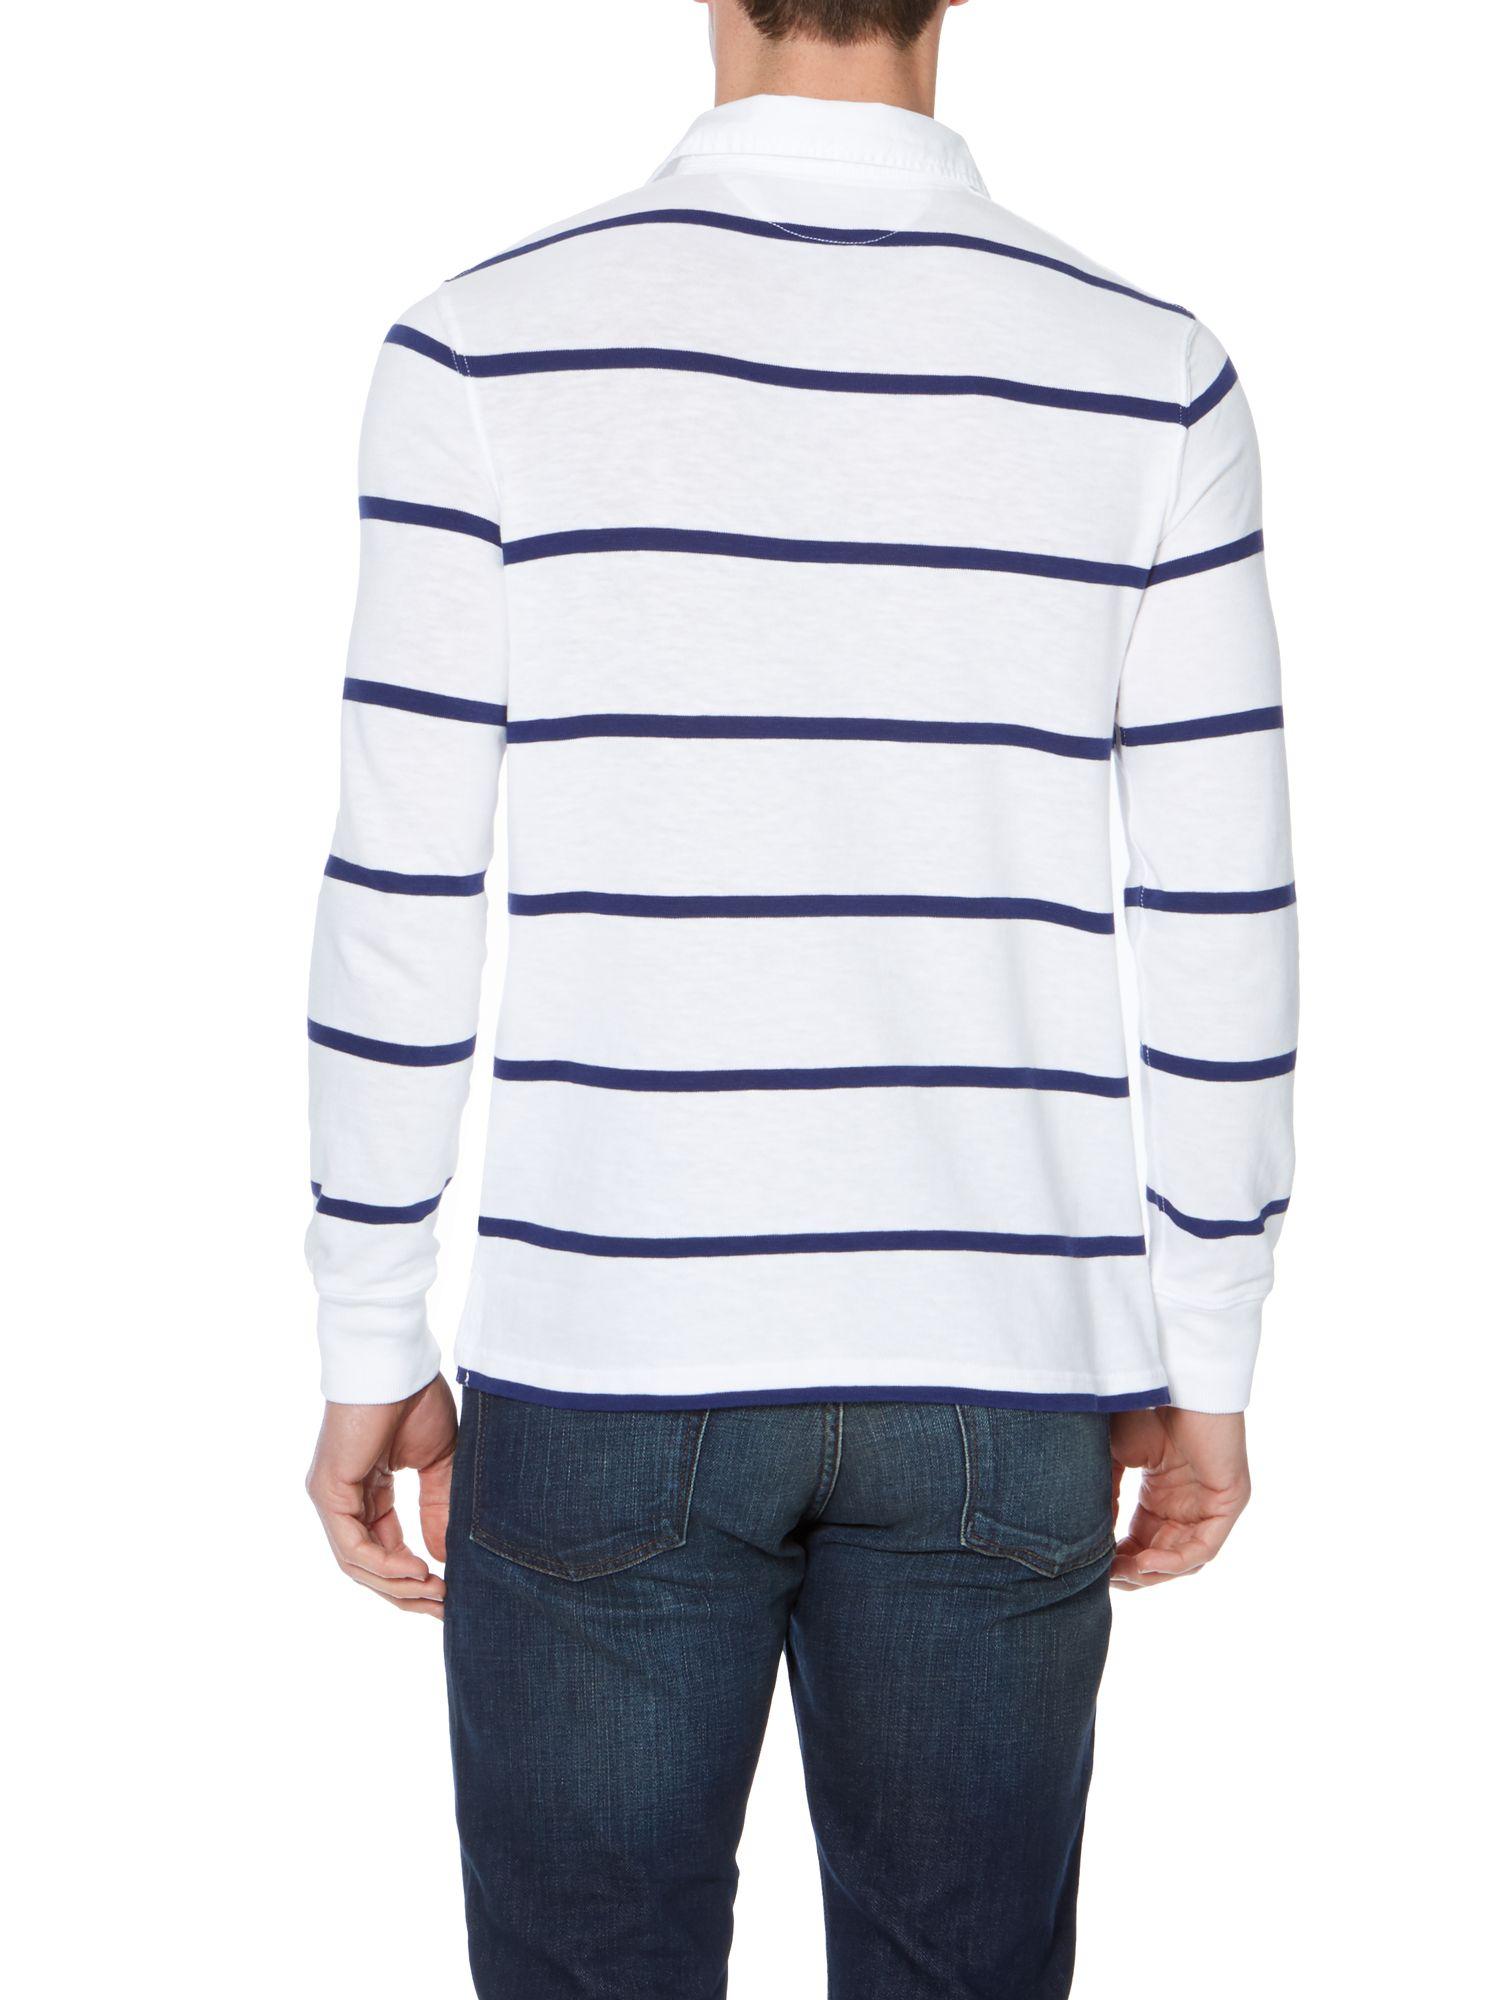 Polo ralph lauren custom fit long sleeve striped rugby for Long sleeve striped rugby shirt